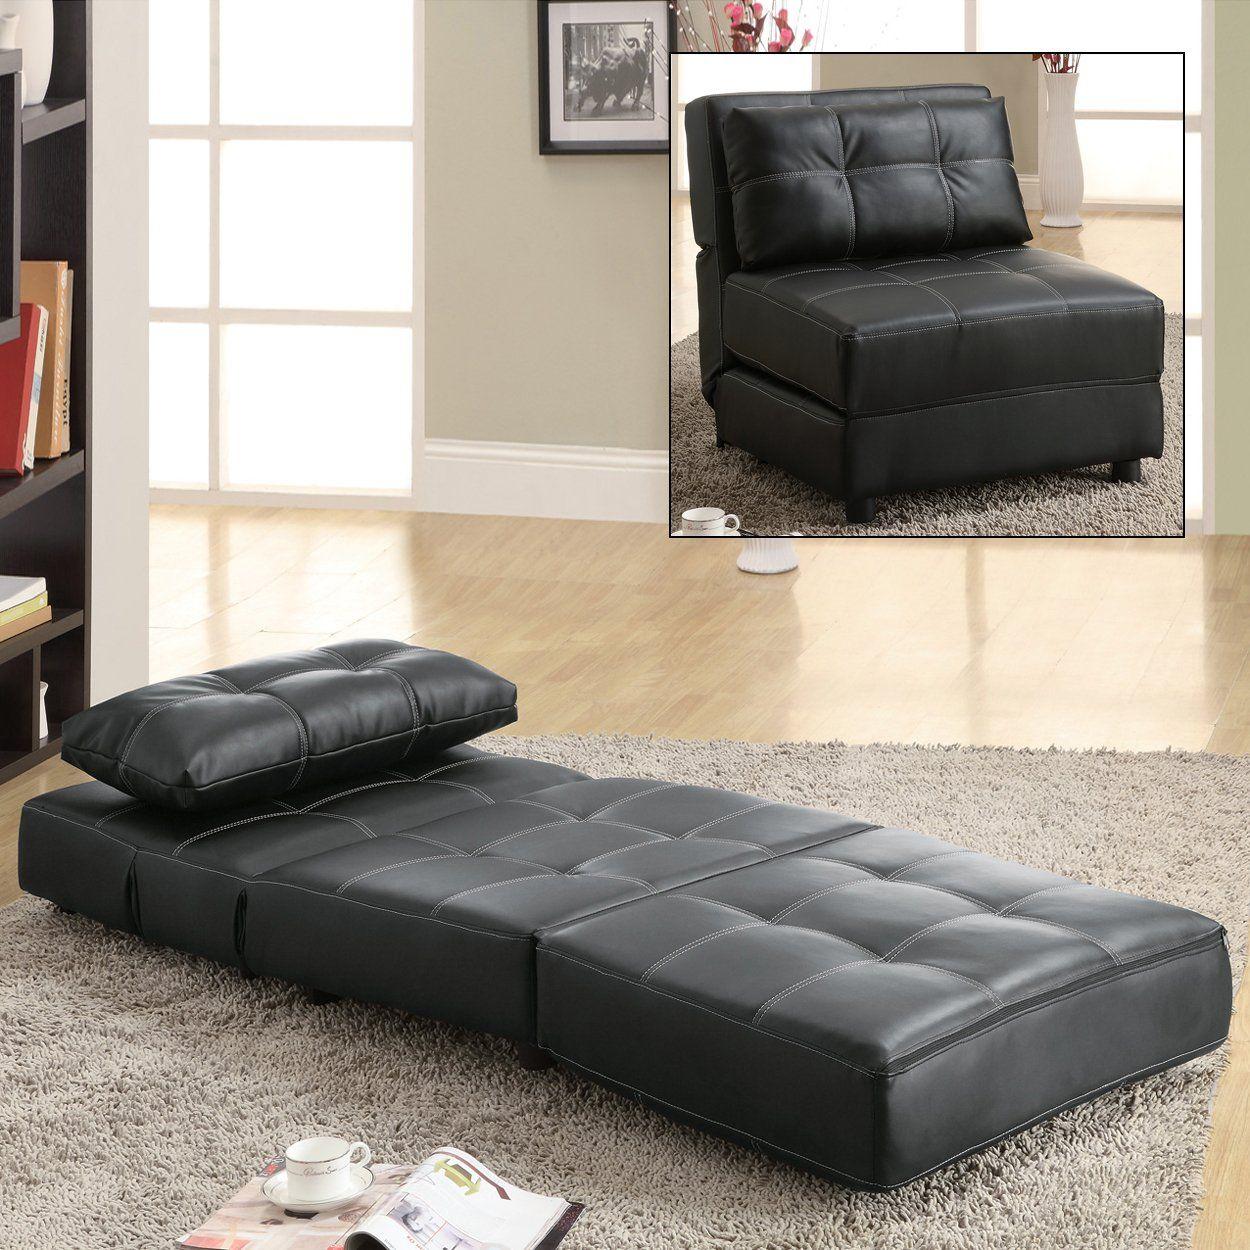 Shop Coaster Fine Furniture 300173 Foldable Lounge Chair